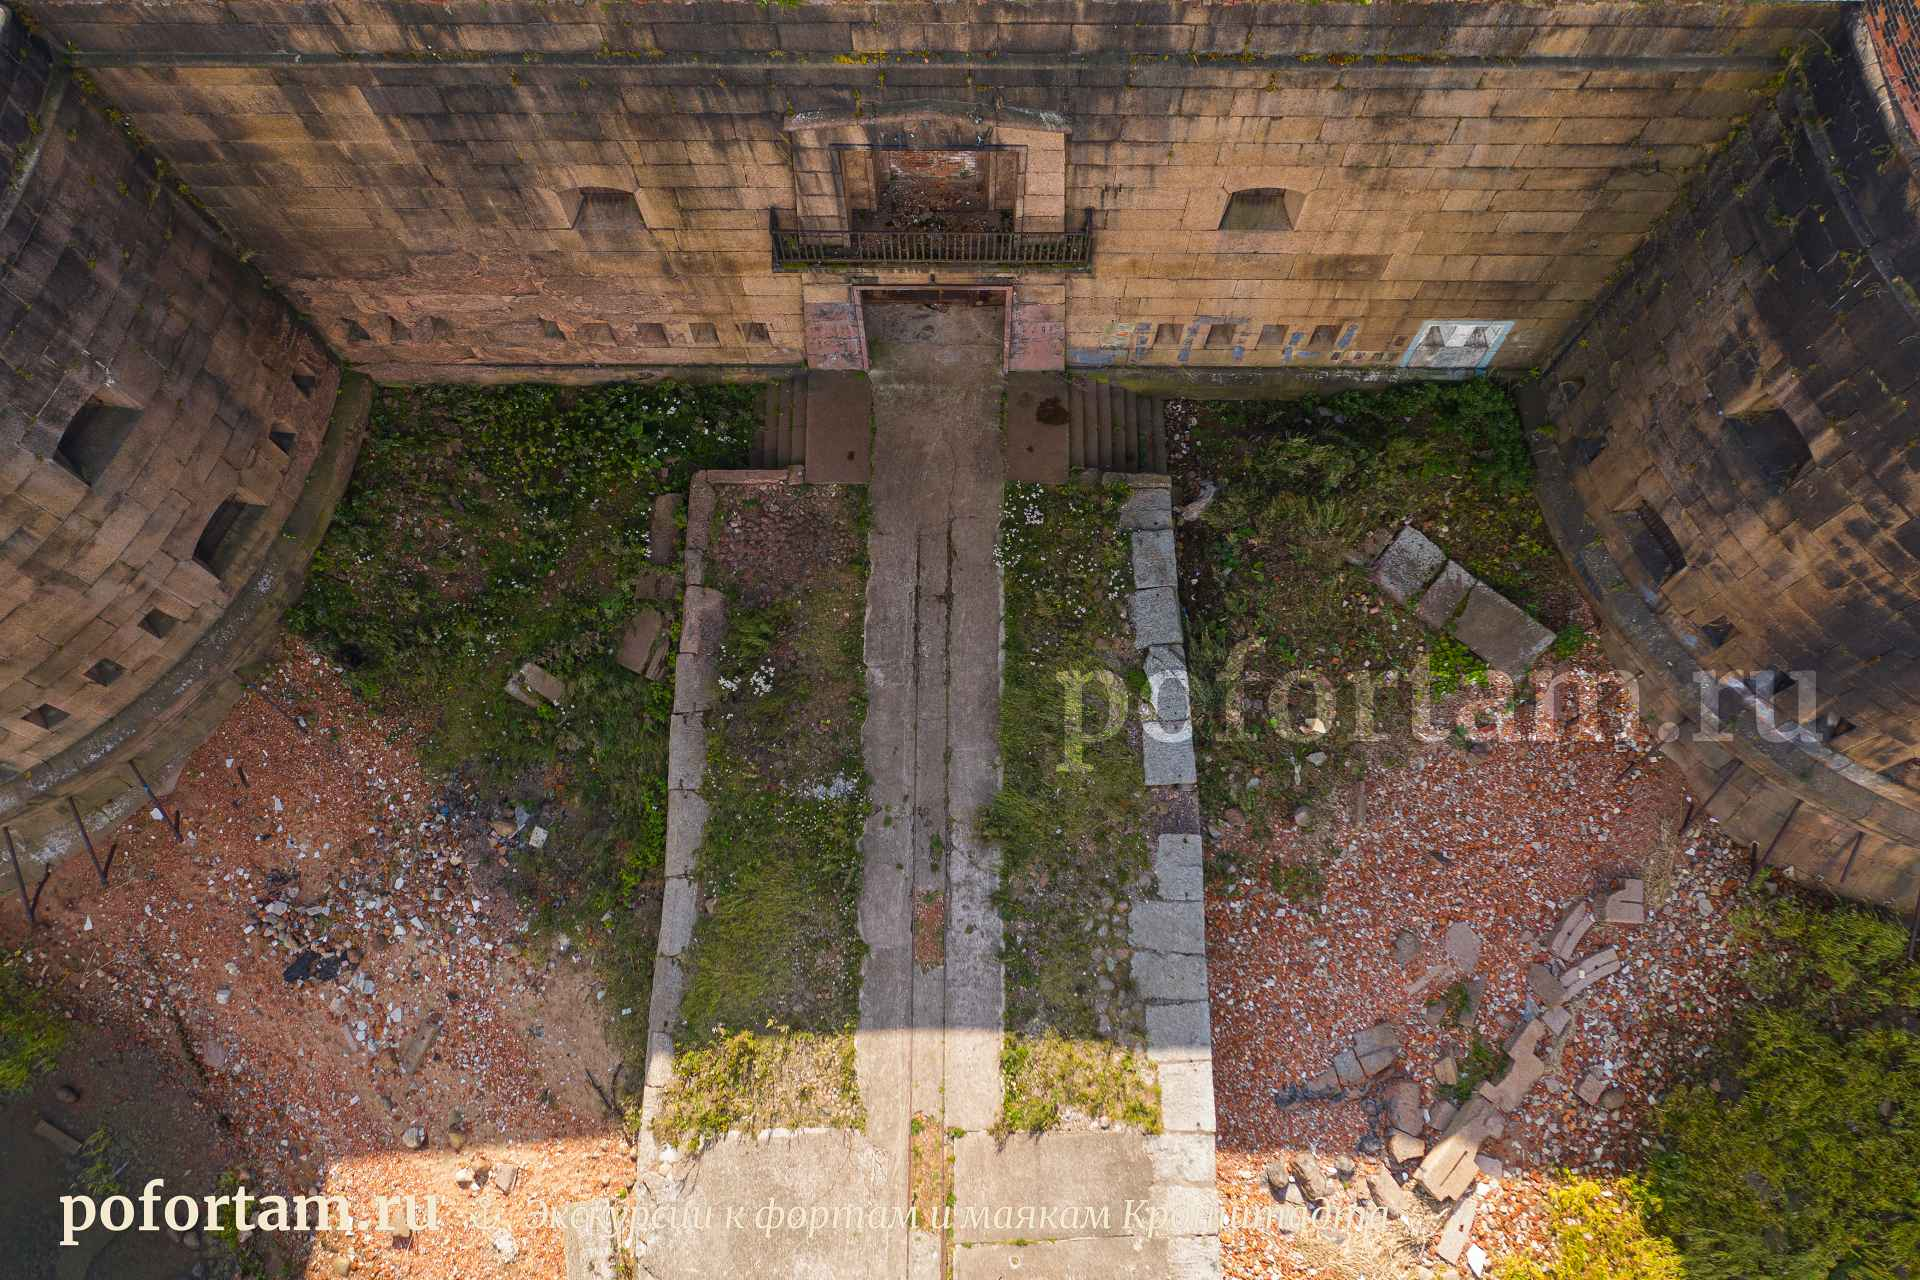 Форт Александр: фото сверху